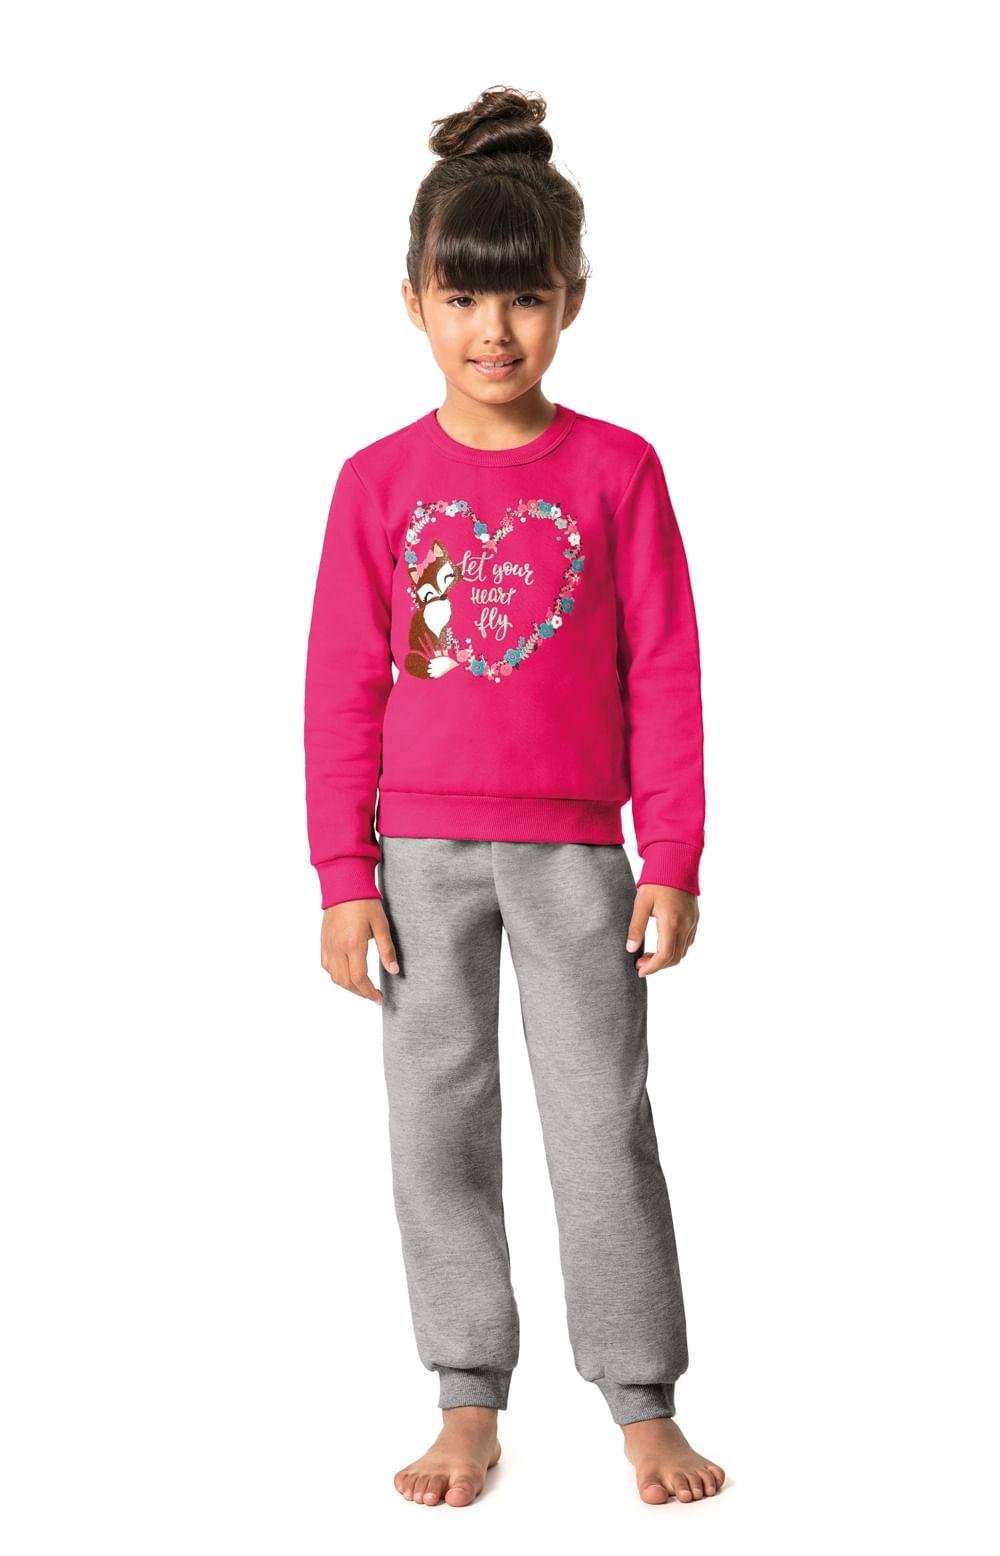 caba09114 Pijama feminino infantil Malwee Liberta - malwee